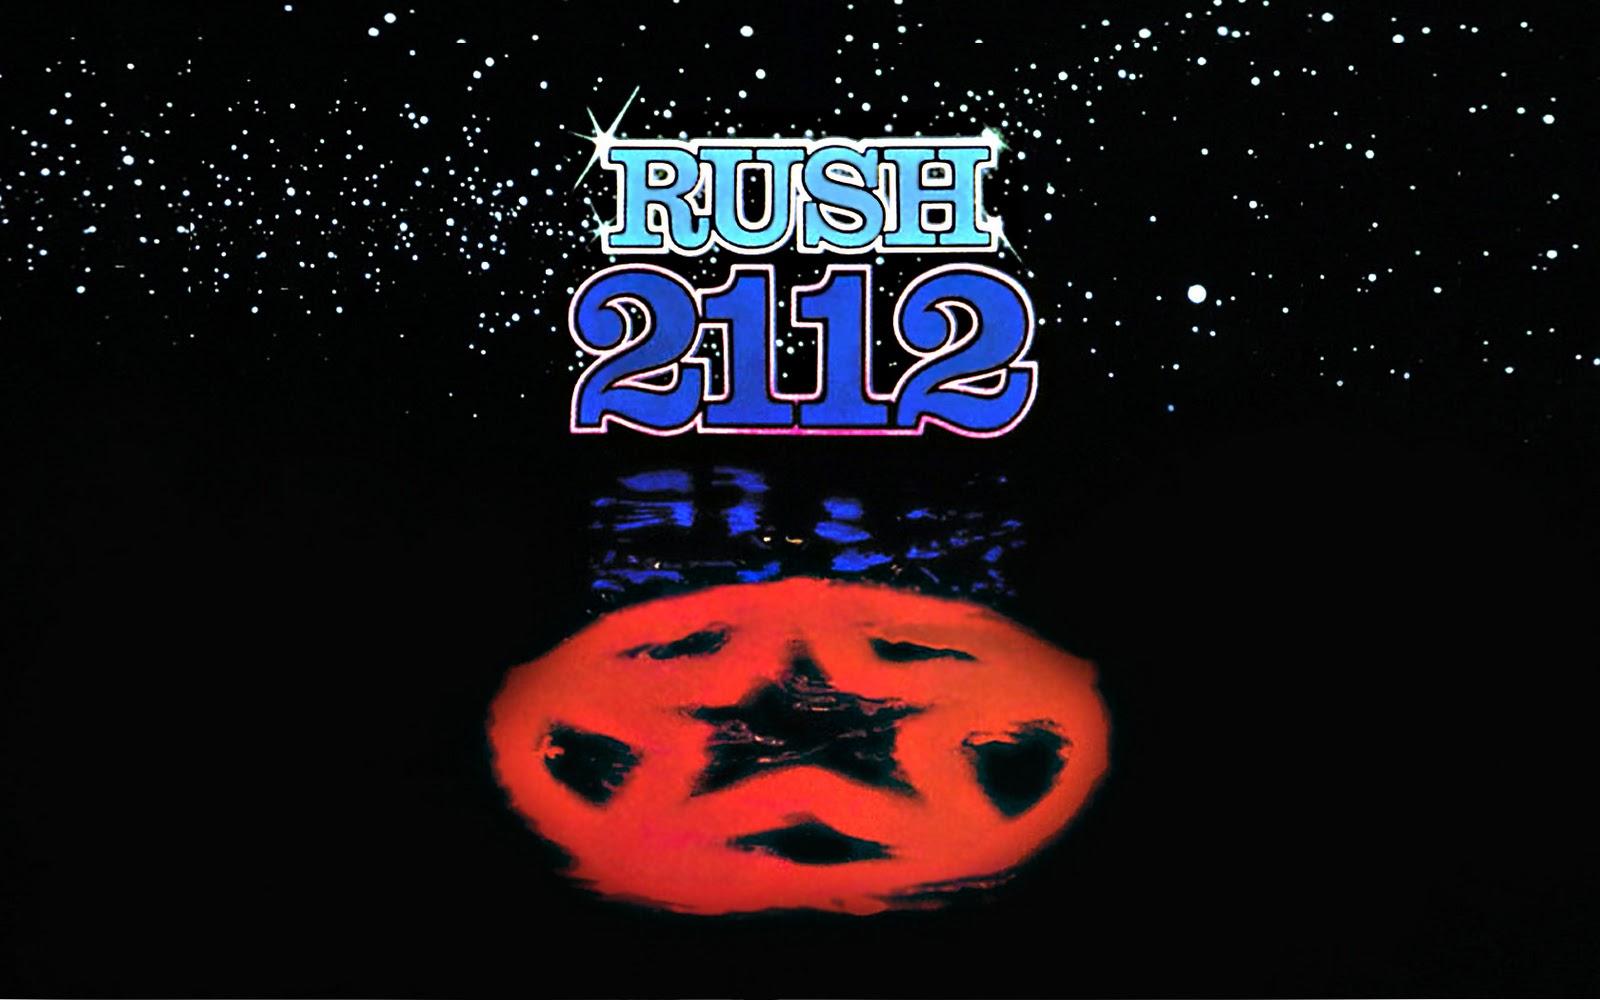 Rush Band Desktop Wallpaper Pictures 1600x1000